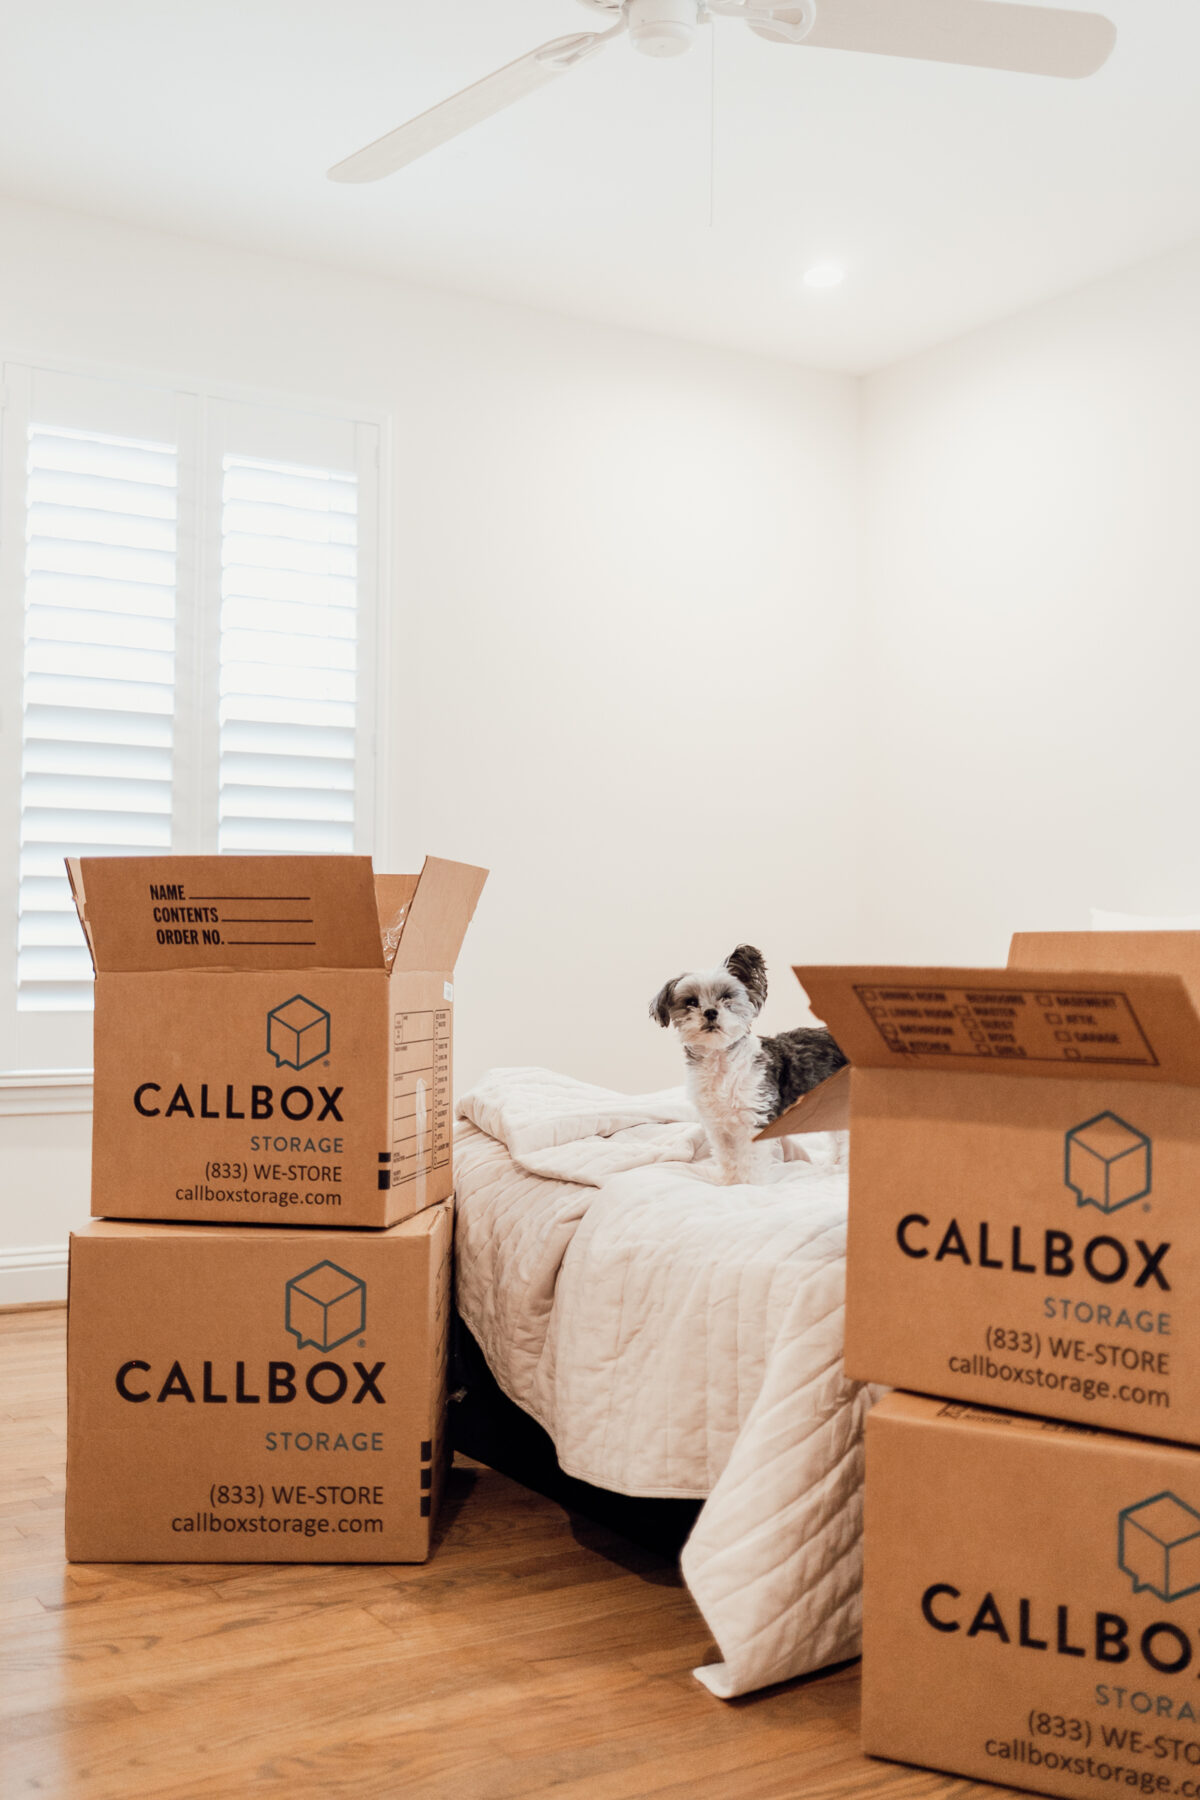 CALLBOX STORAGE review